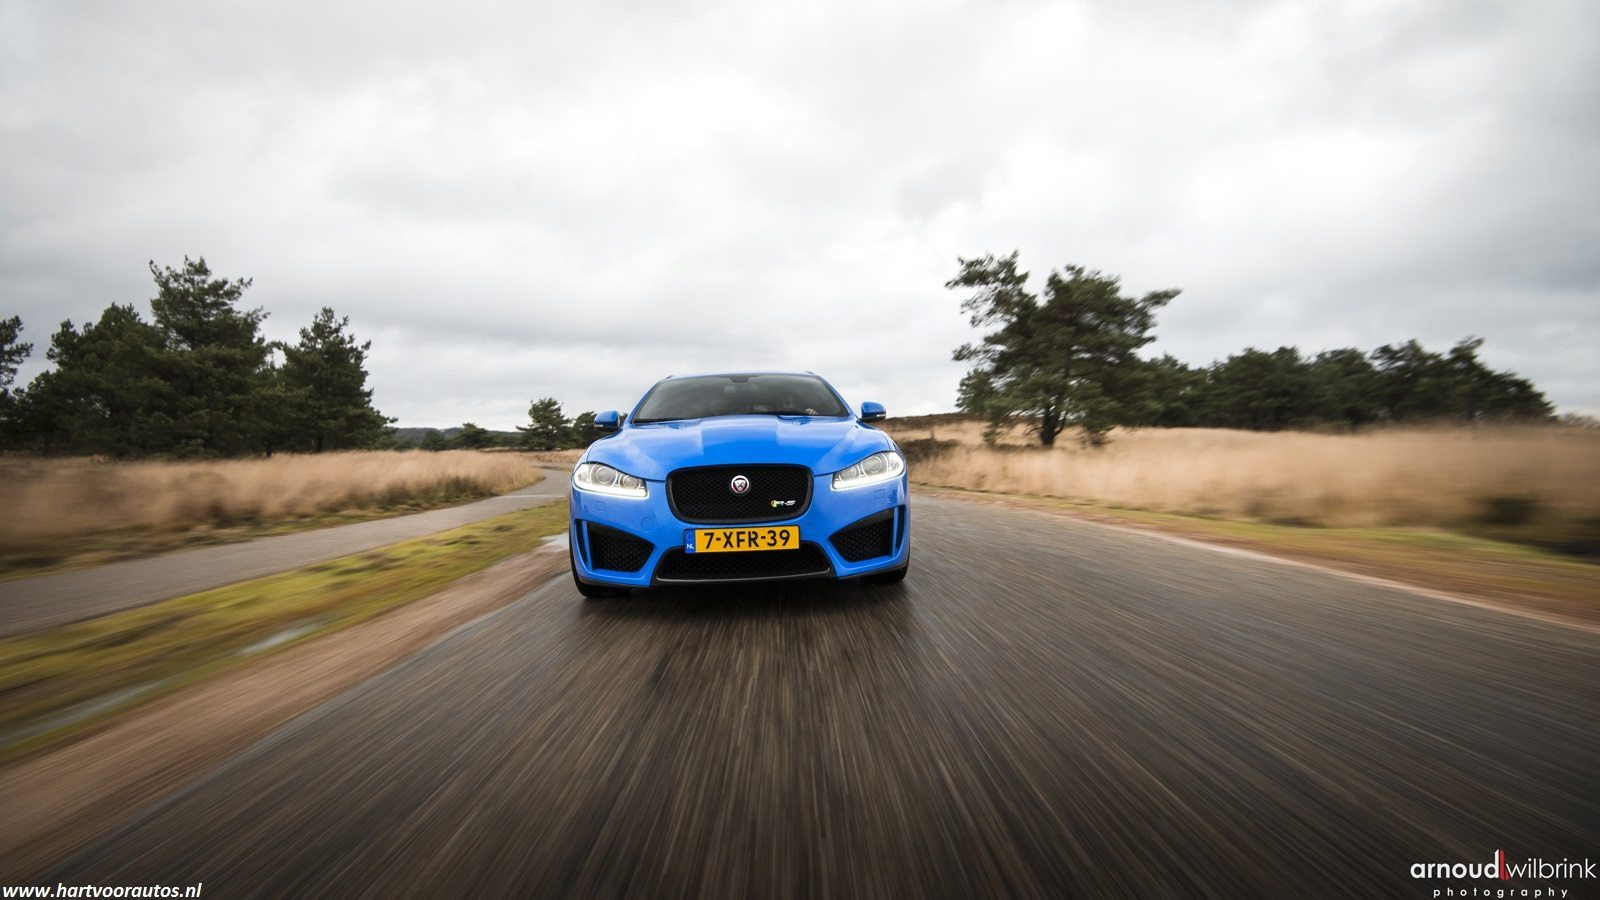 Jaguar XFR-S Sportbrake - www.hartvoorautos.nl